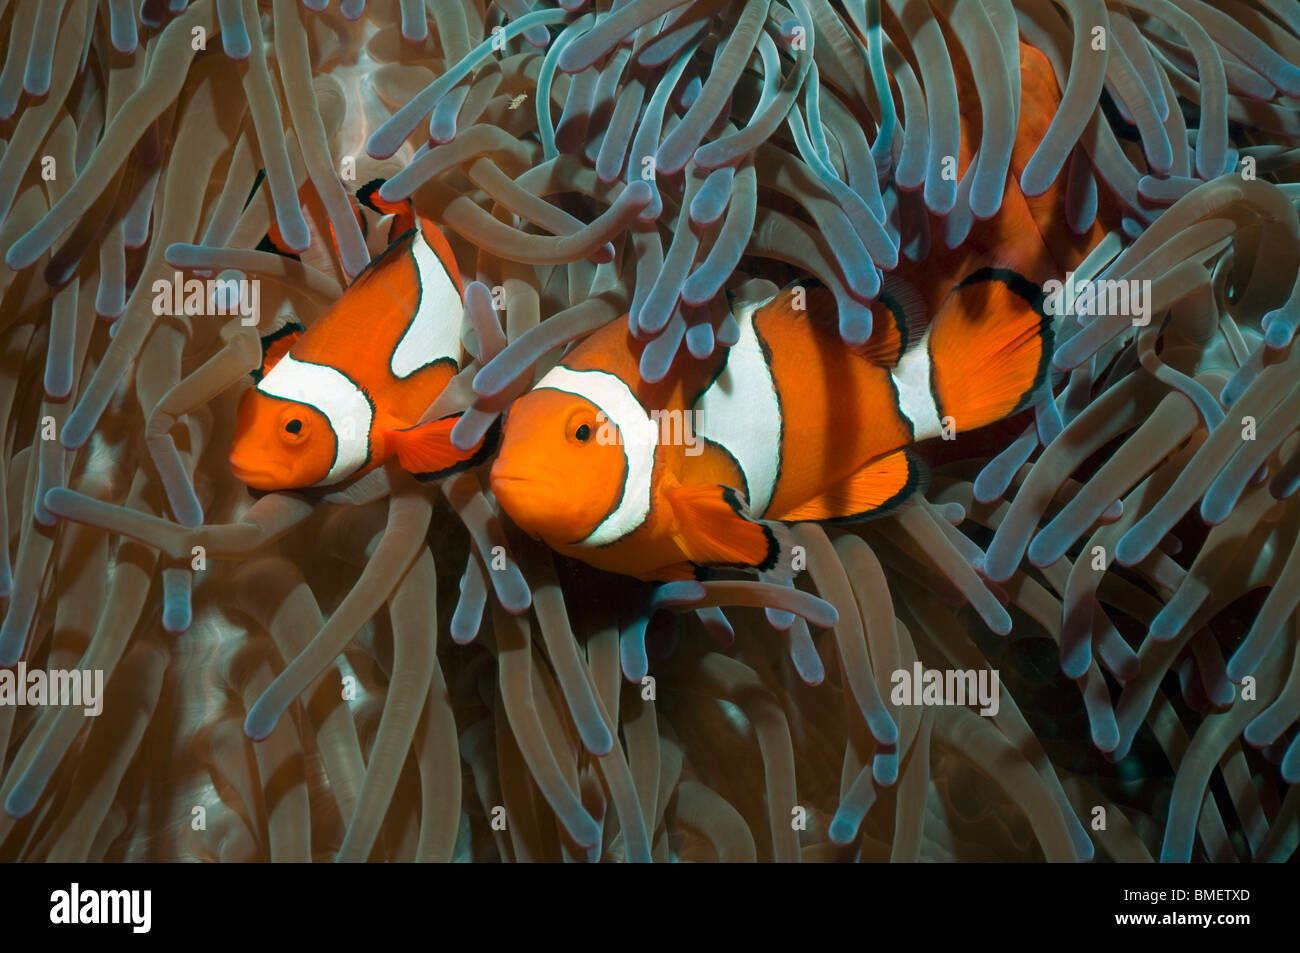 Falscher Clown Anemonenfischen, größeren Weibchen mit Männchen.  Papua-Neu-Guinea. Stockbild